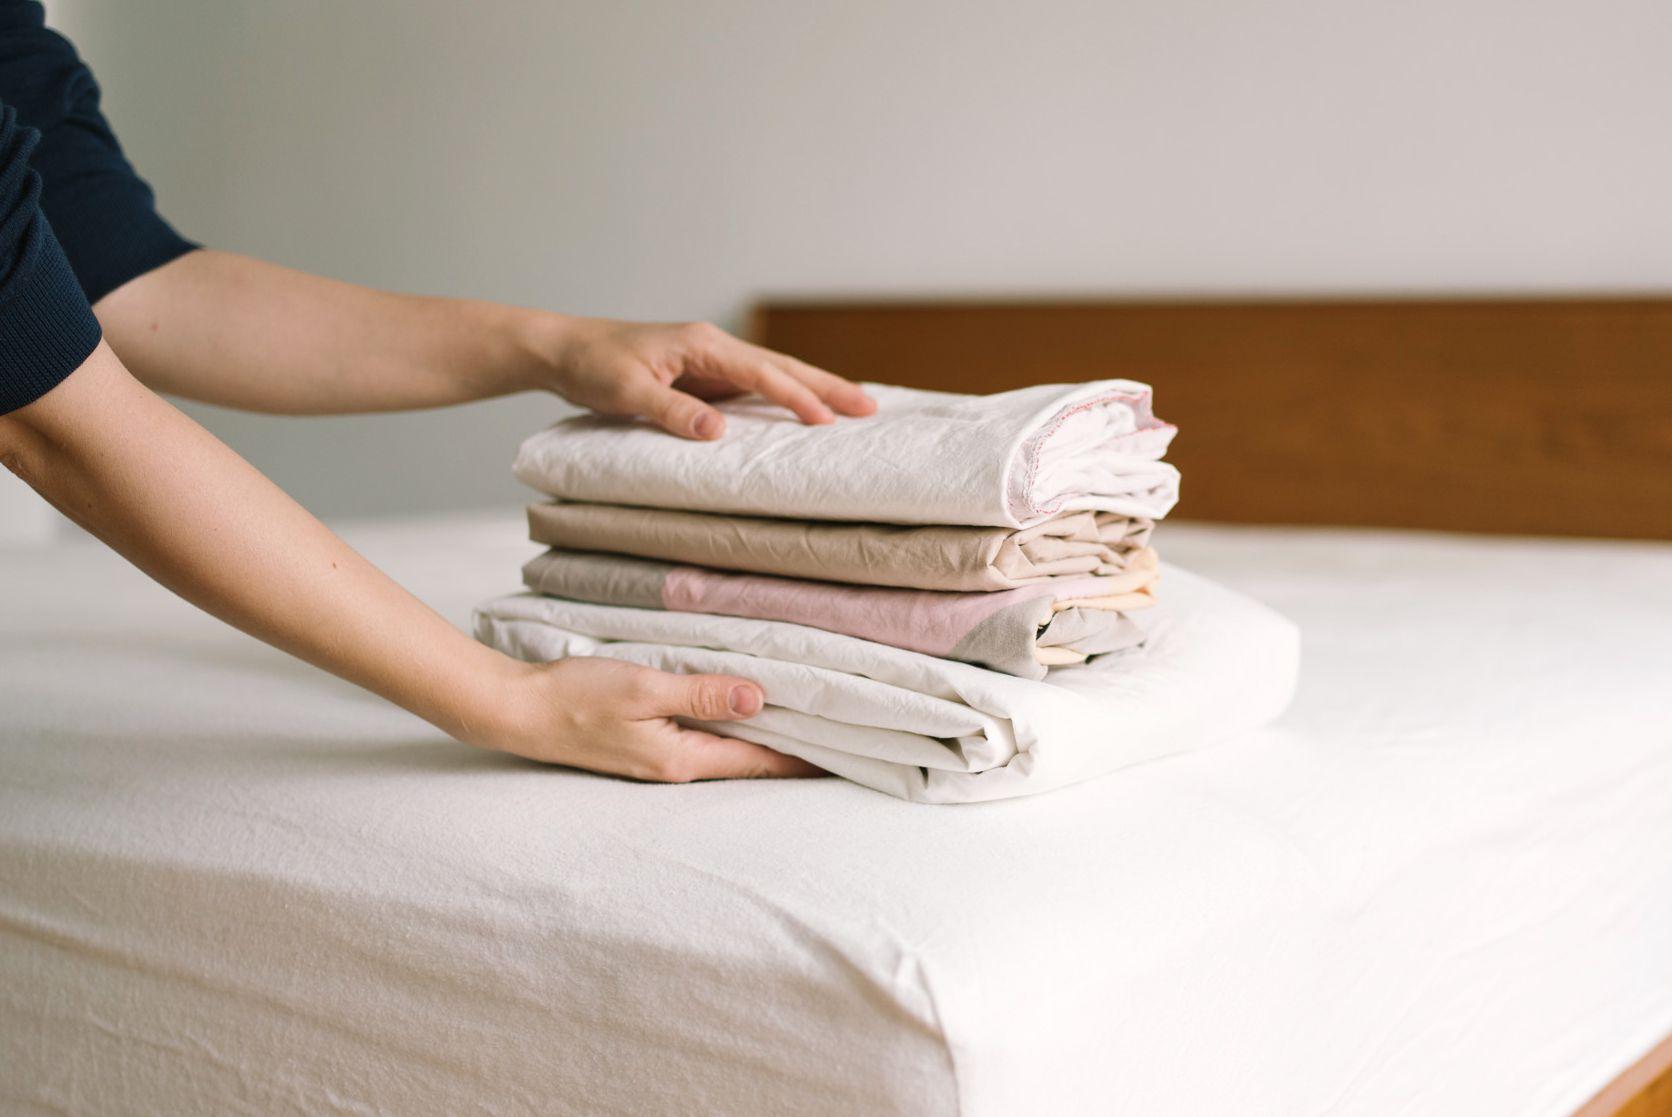 folding fresh linens